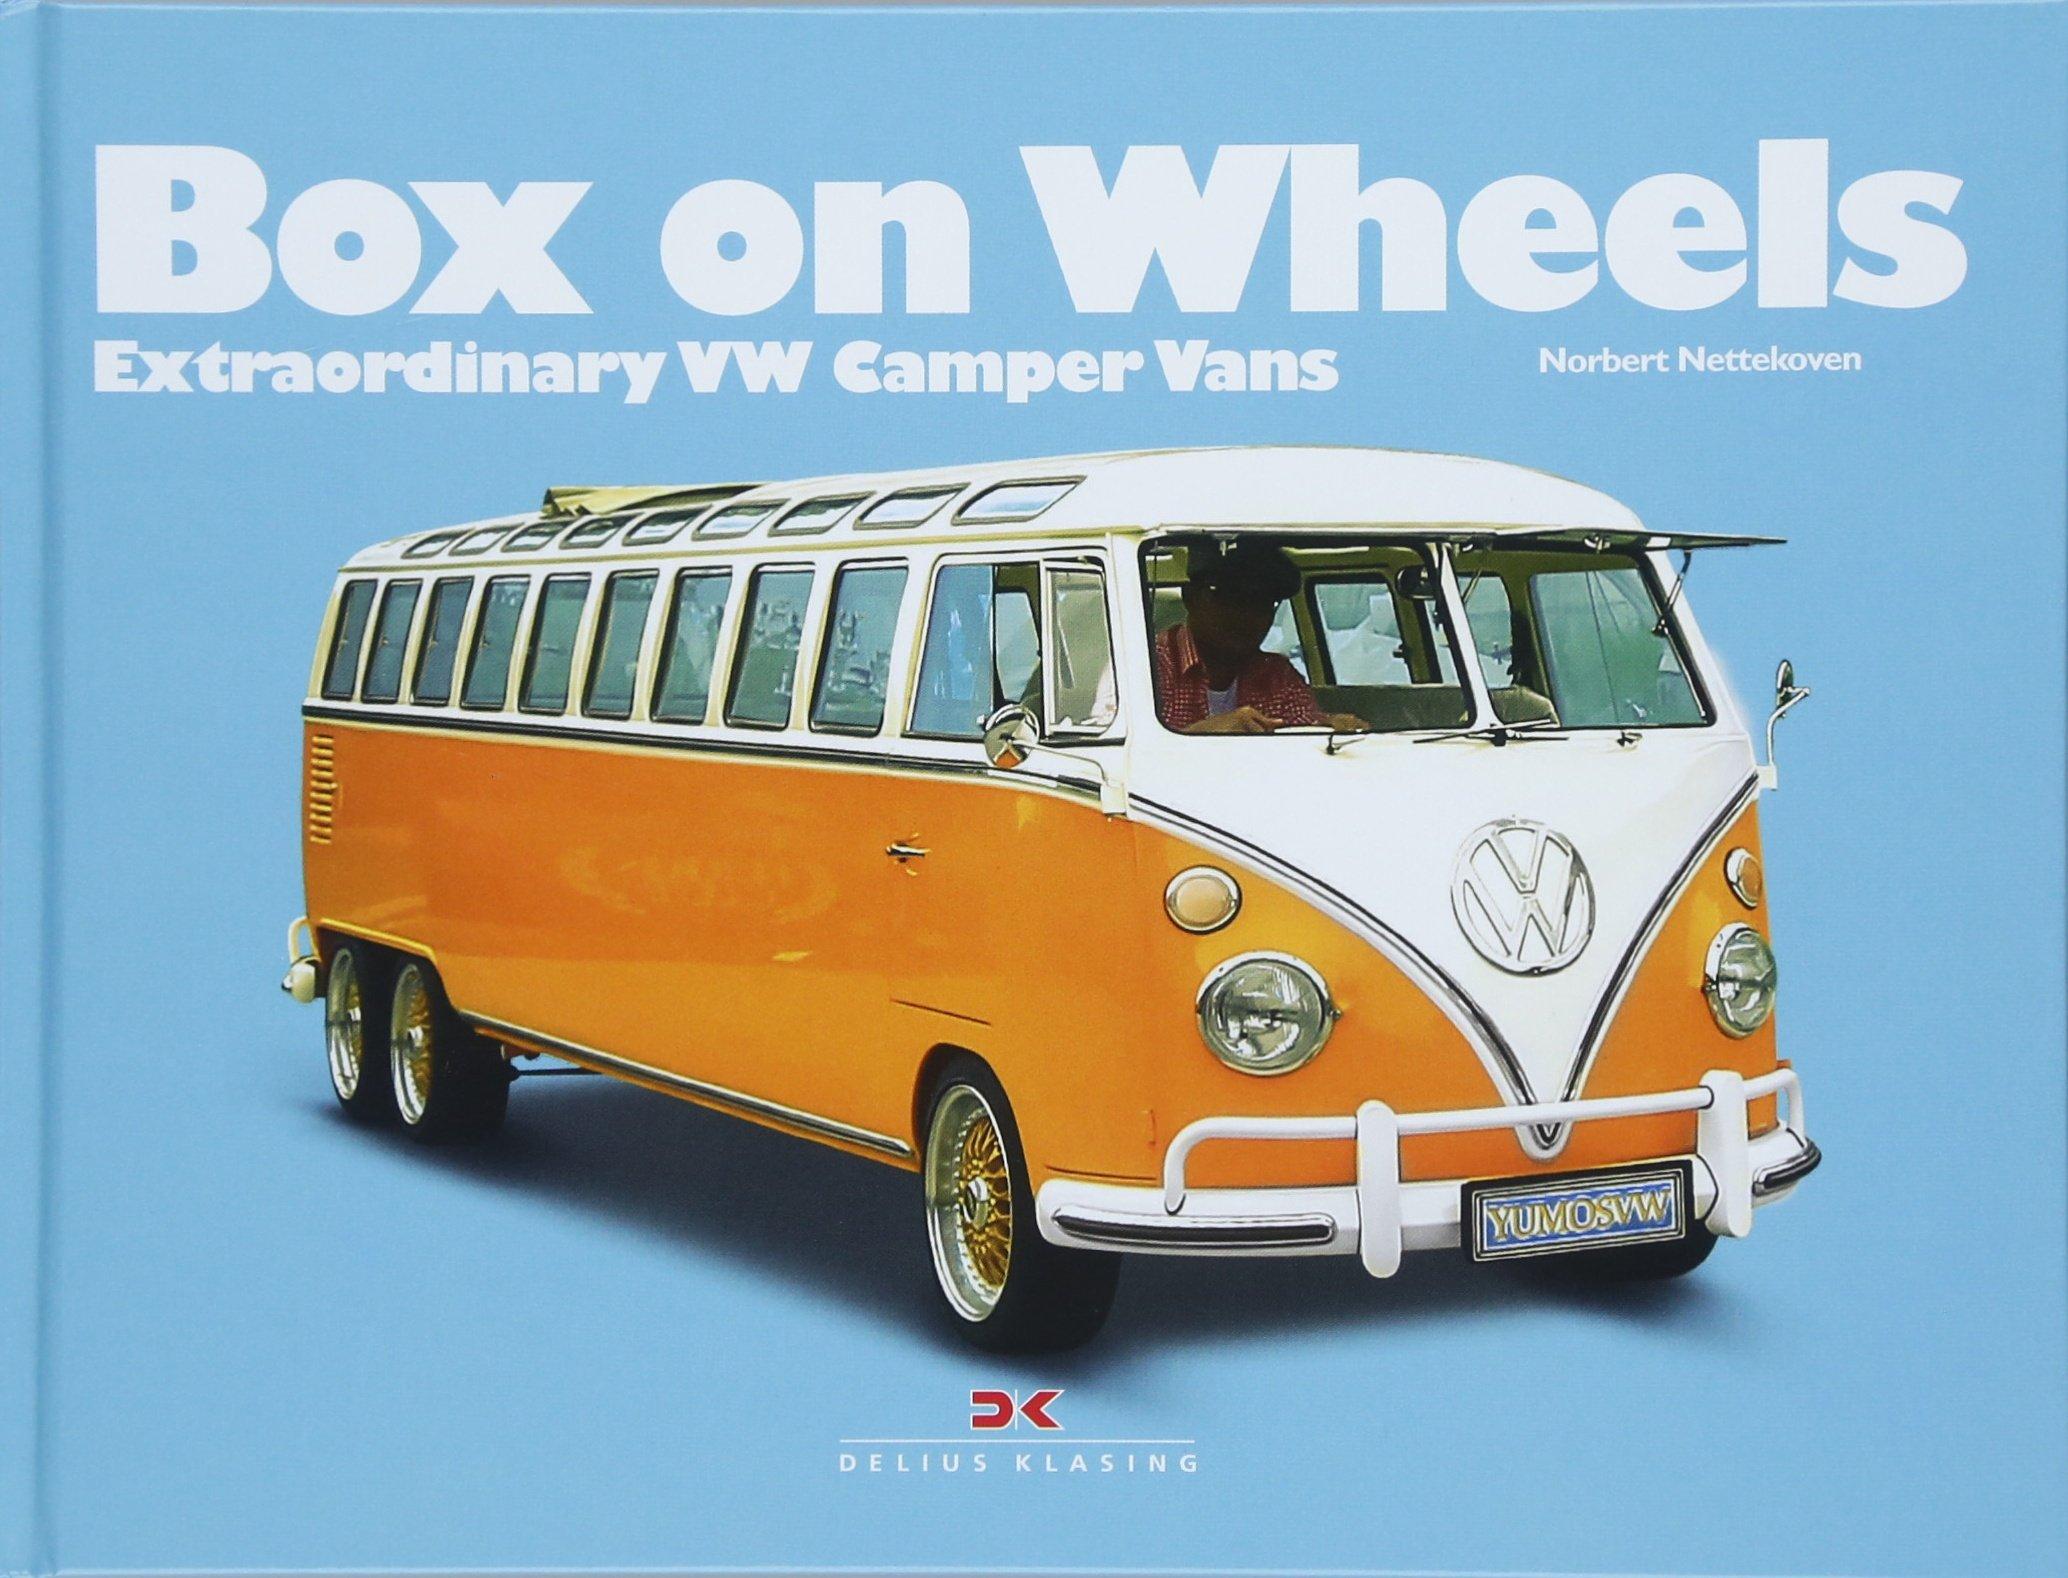 Box on Wheels: Extraordinary VW Camper Vans